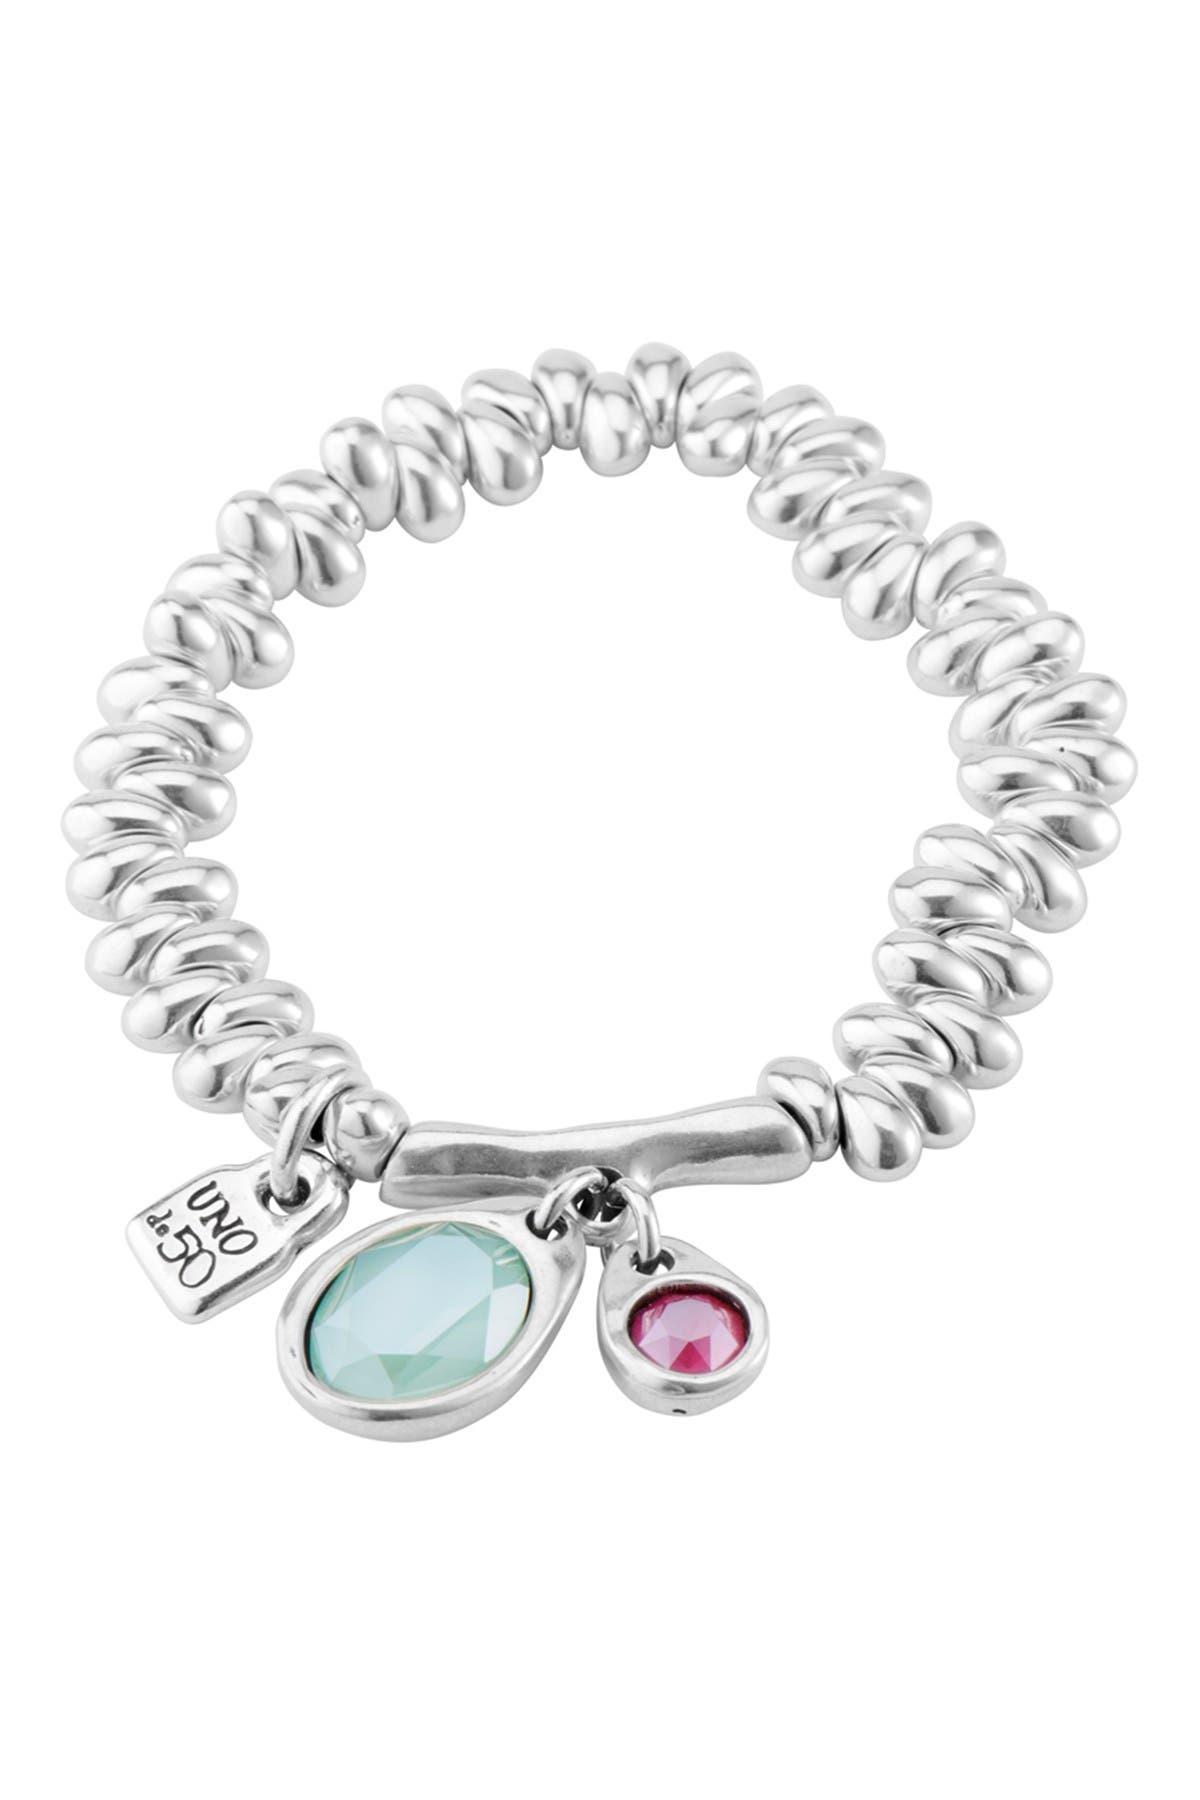 Image of Uno De 50 Eclipse Silver Plated Bracelet